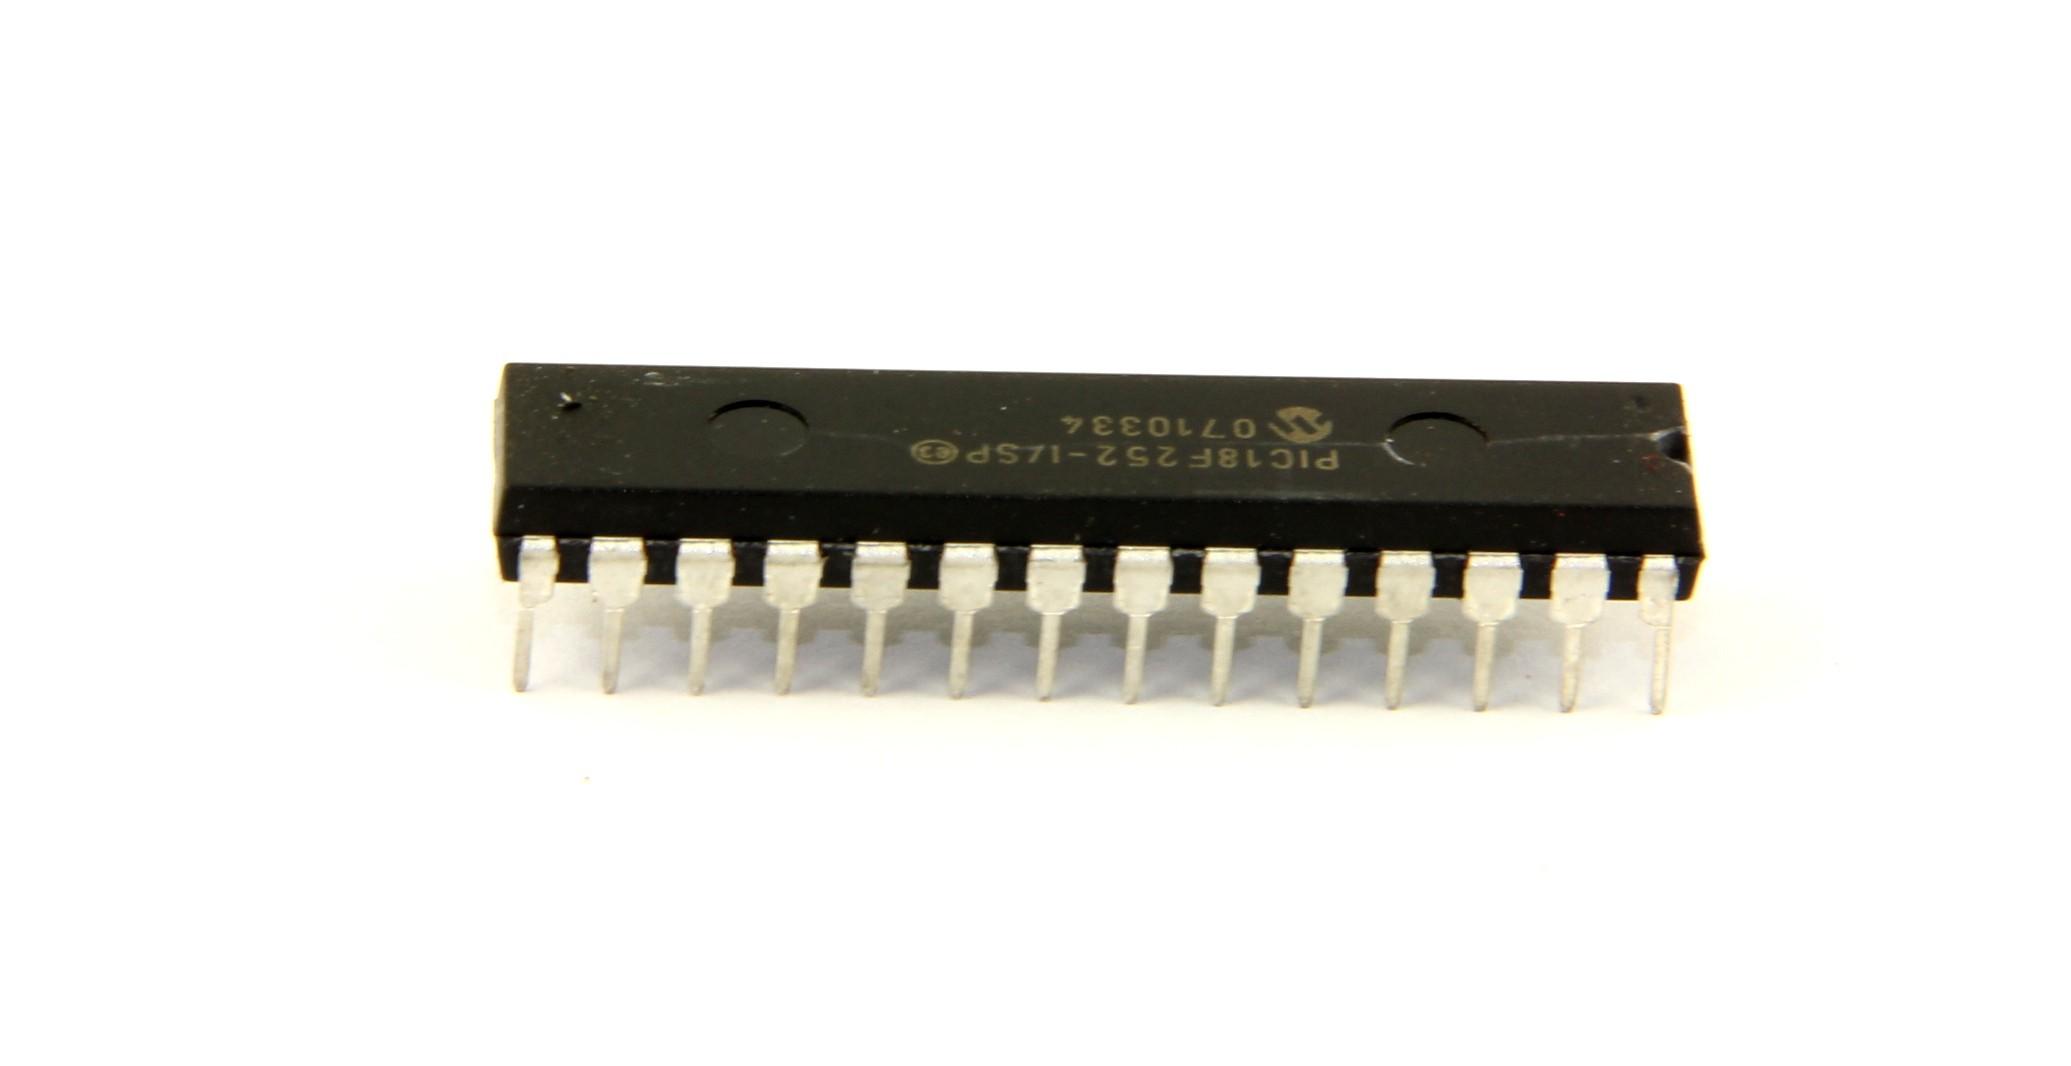 Prosessori v0922, ketjuveto BM+50 / BQ50